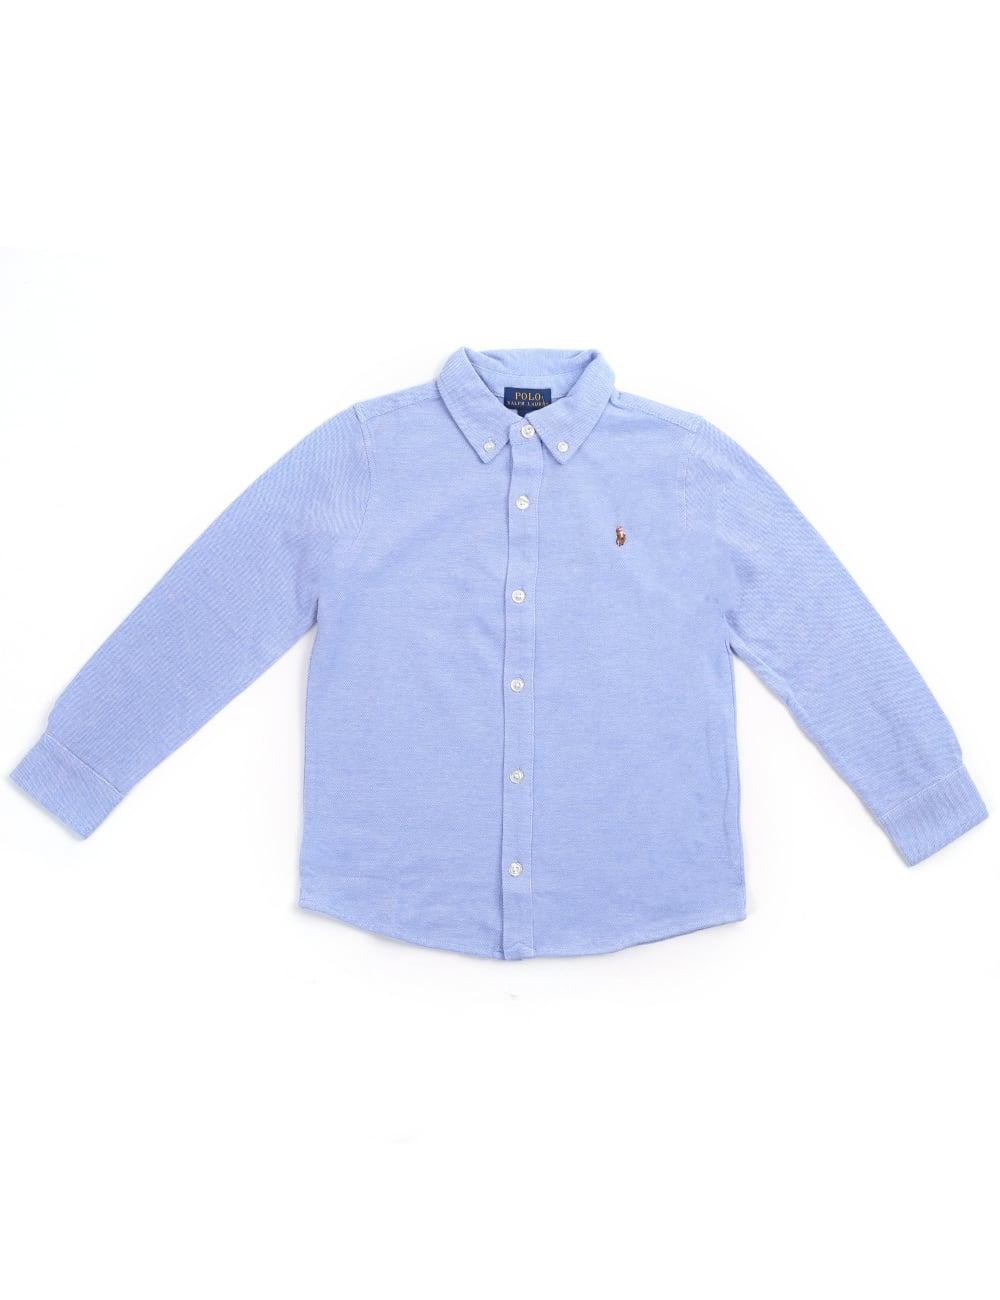 Long Oxford Polo Sleeve Knit Older Boys Ralph Lauren Shirt 5Rj34AL